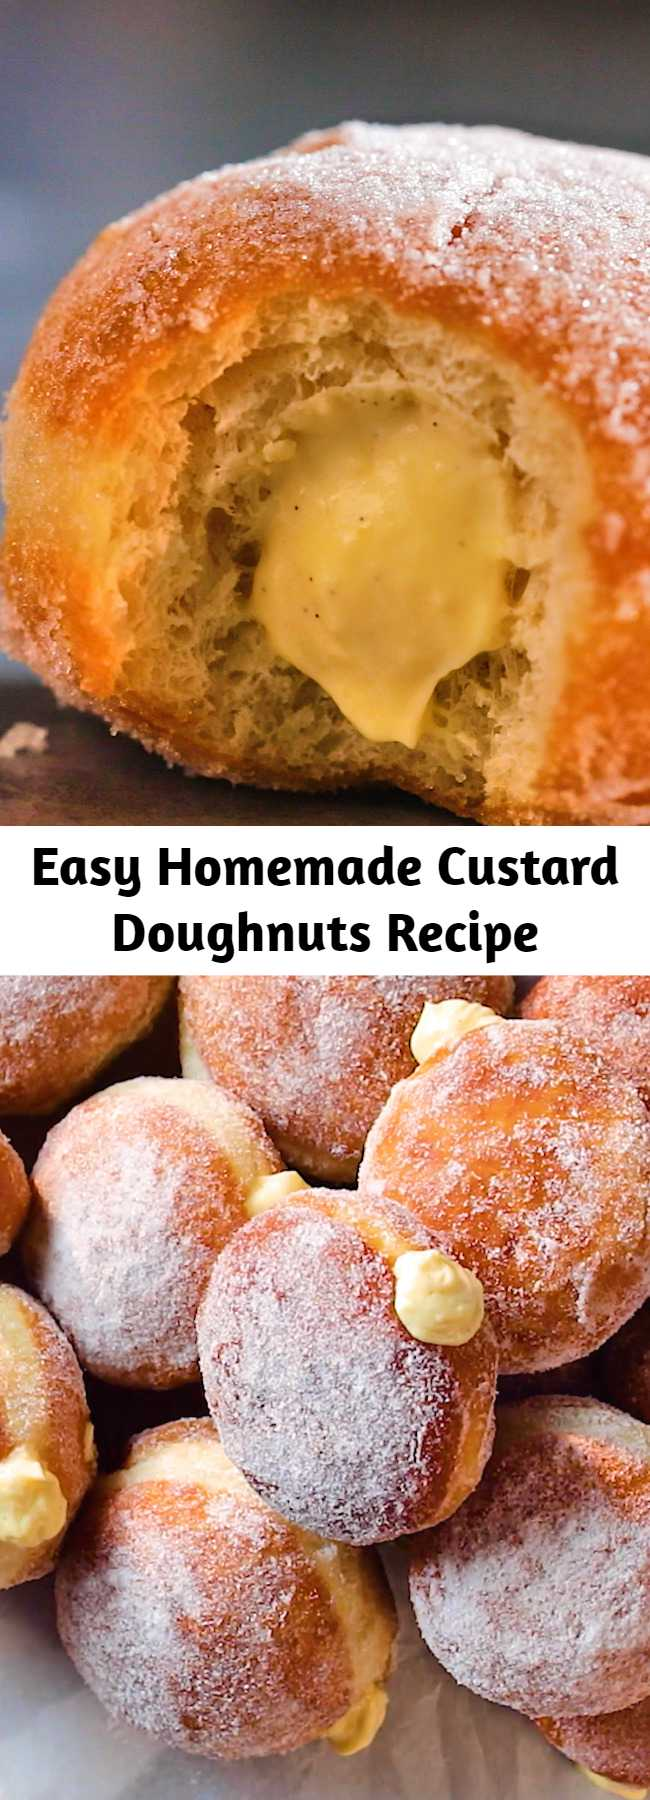 Easy Homemade Custard Doughnuts Recipe